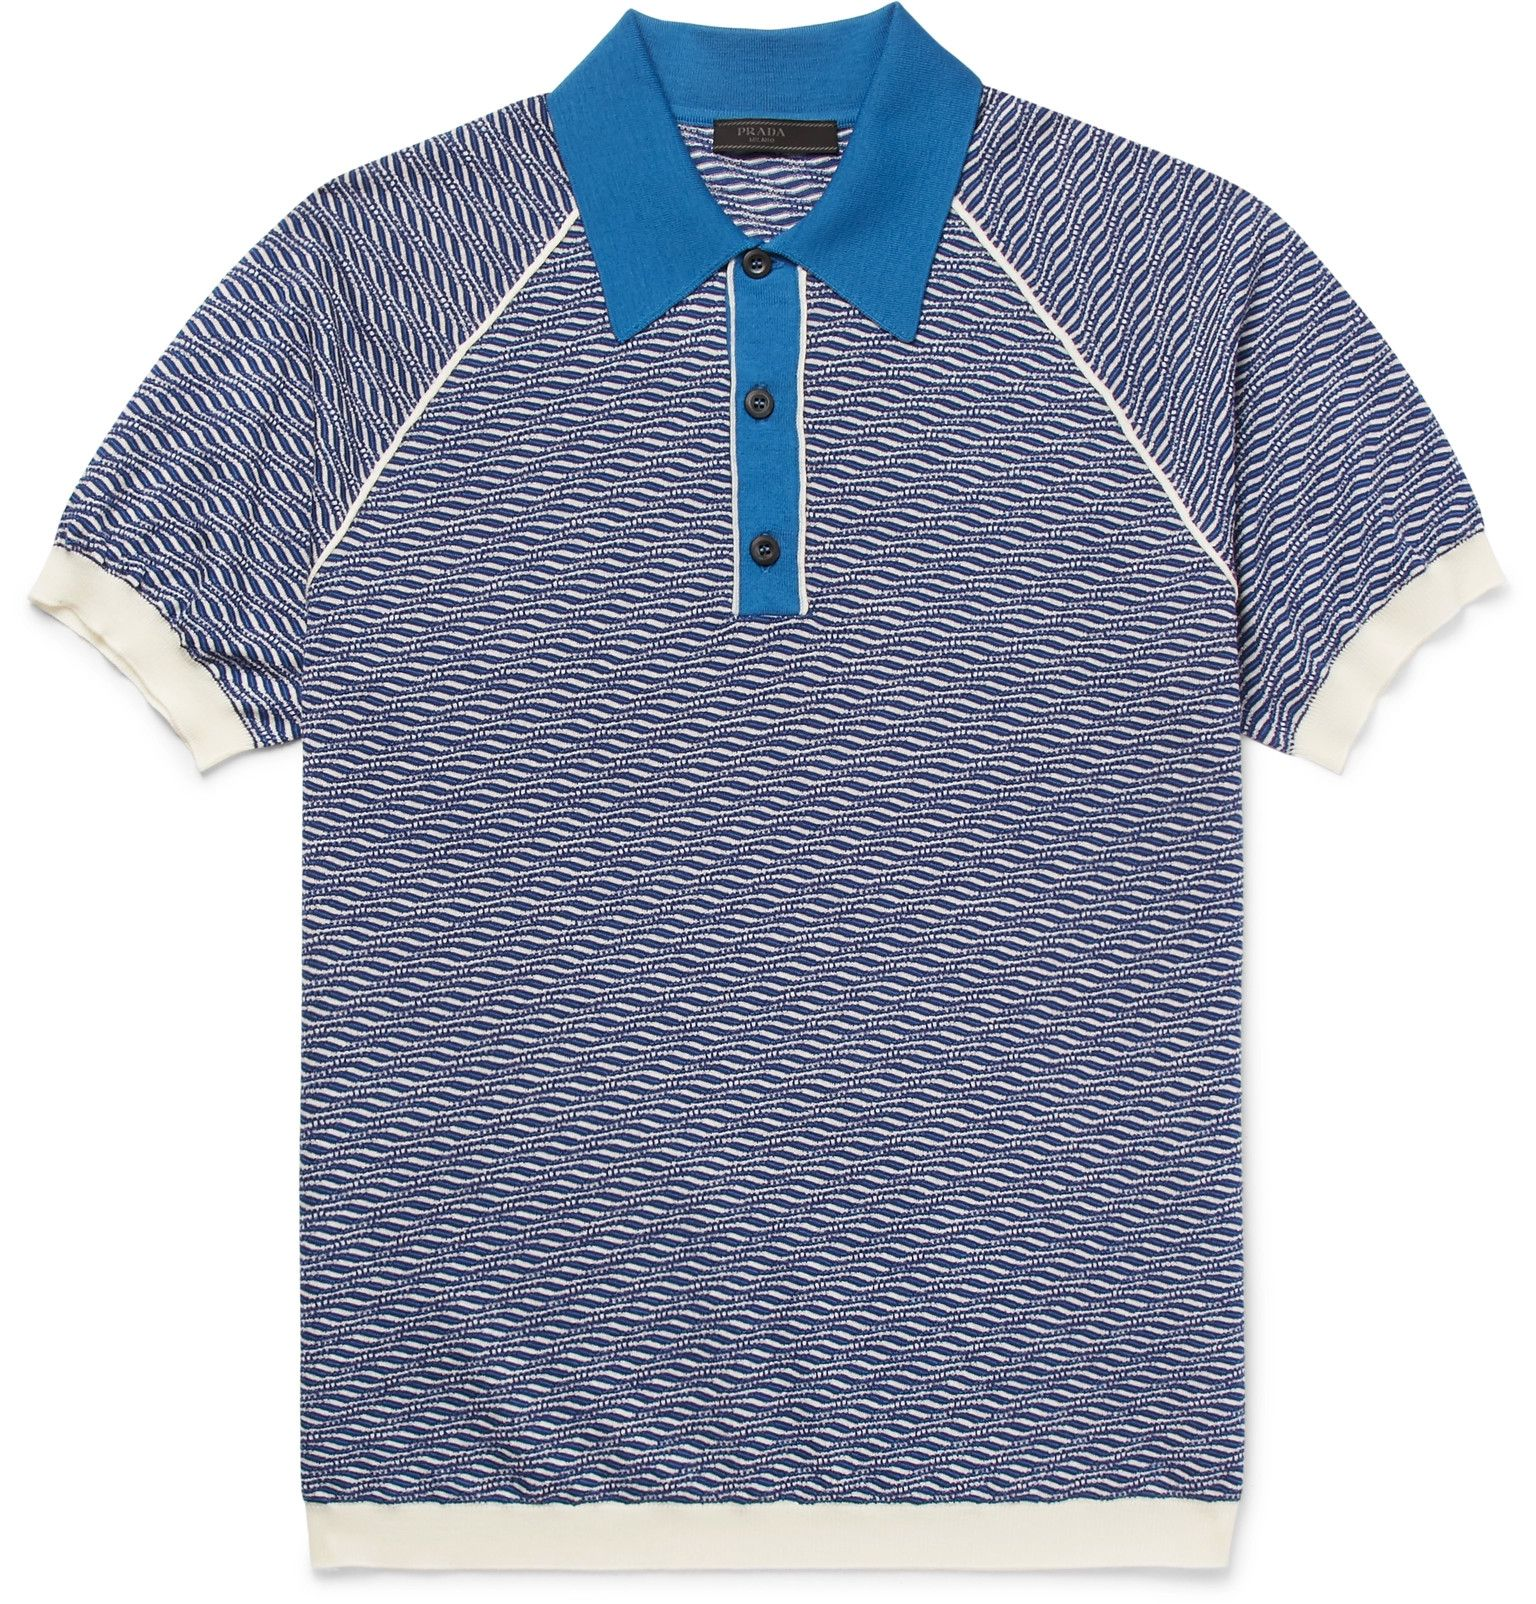 Prada Slim-Fit Jacquard-Knit Wool Polo Shirt  0546572da1105